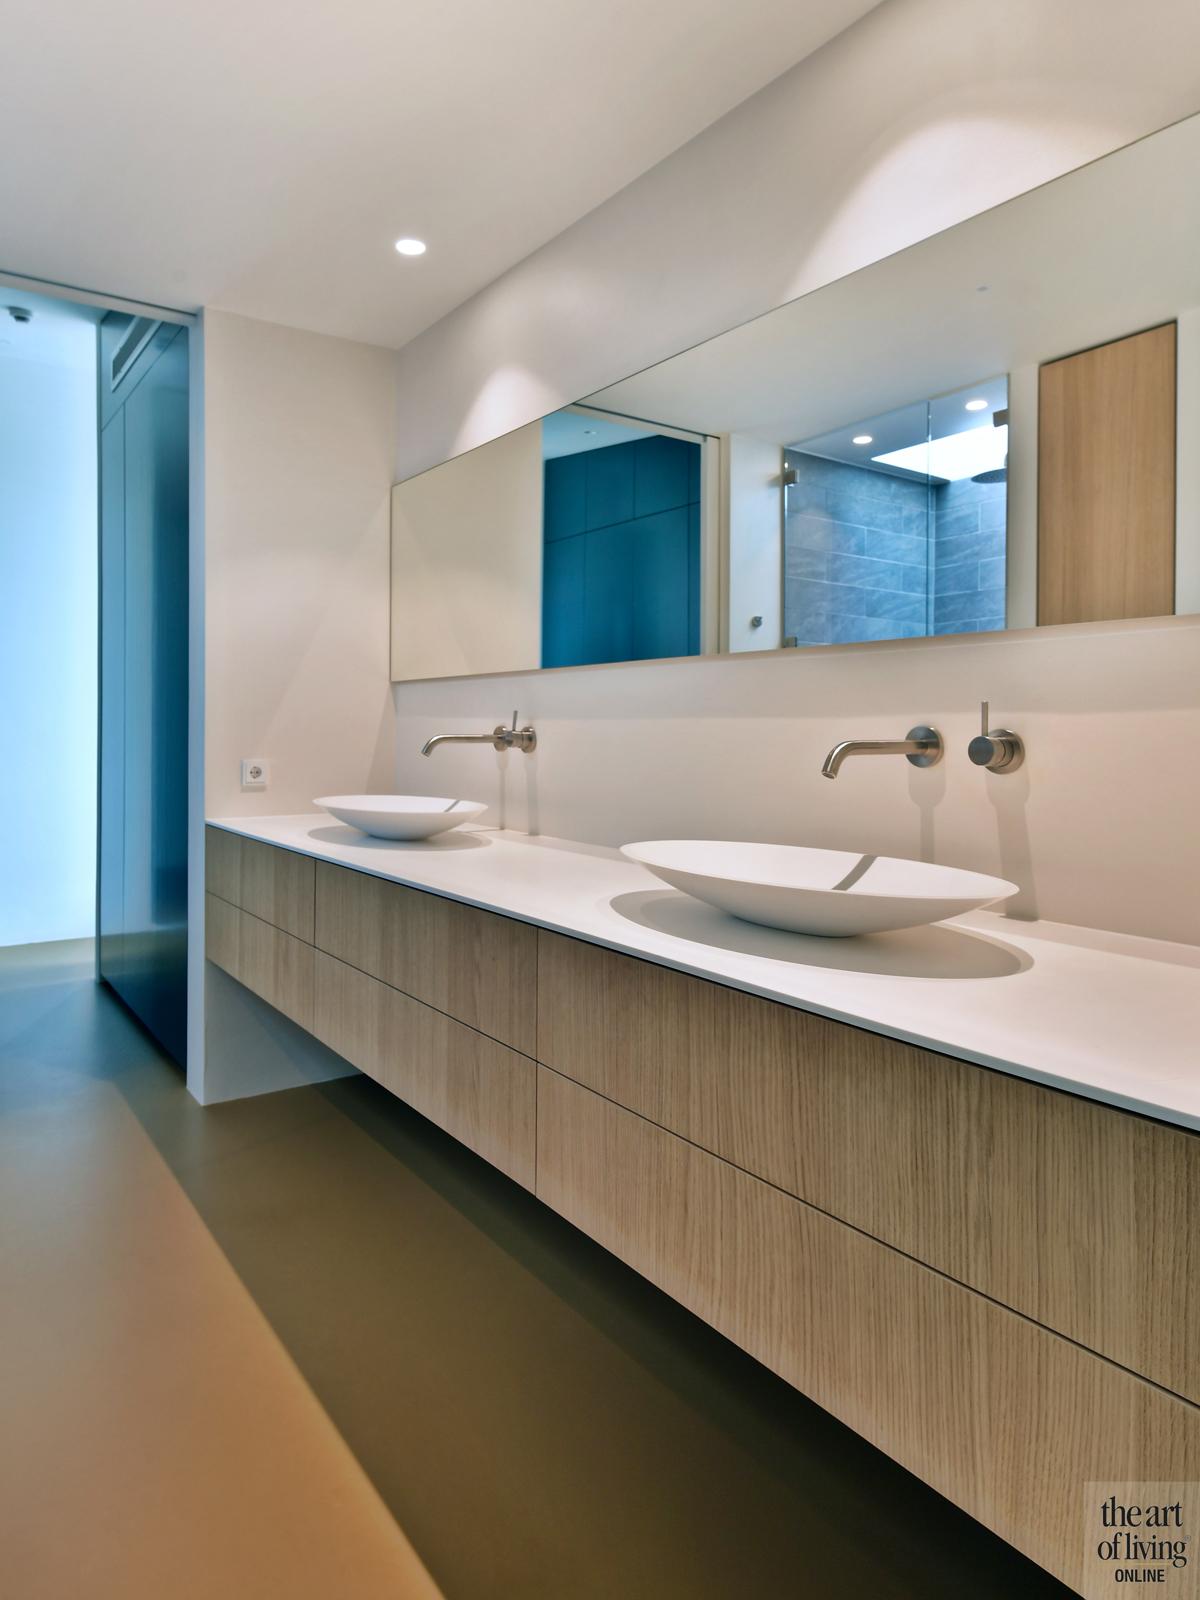 Natuurlijke omgeving, 123DV Architecten, Badkamer, Waskom, Wastafel, Badkamer design, Badkamerdesign, Moderne badkamer